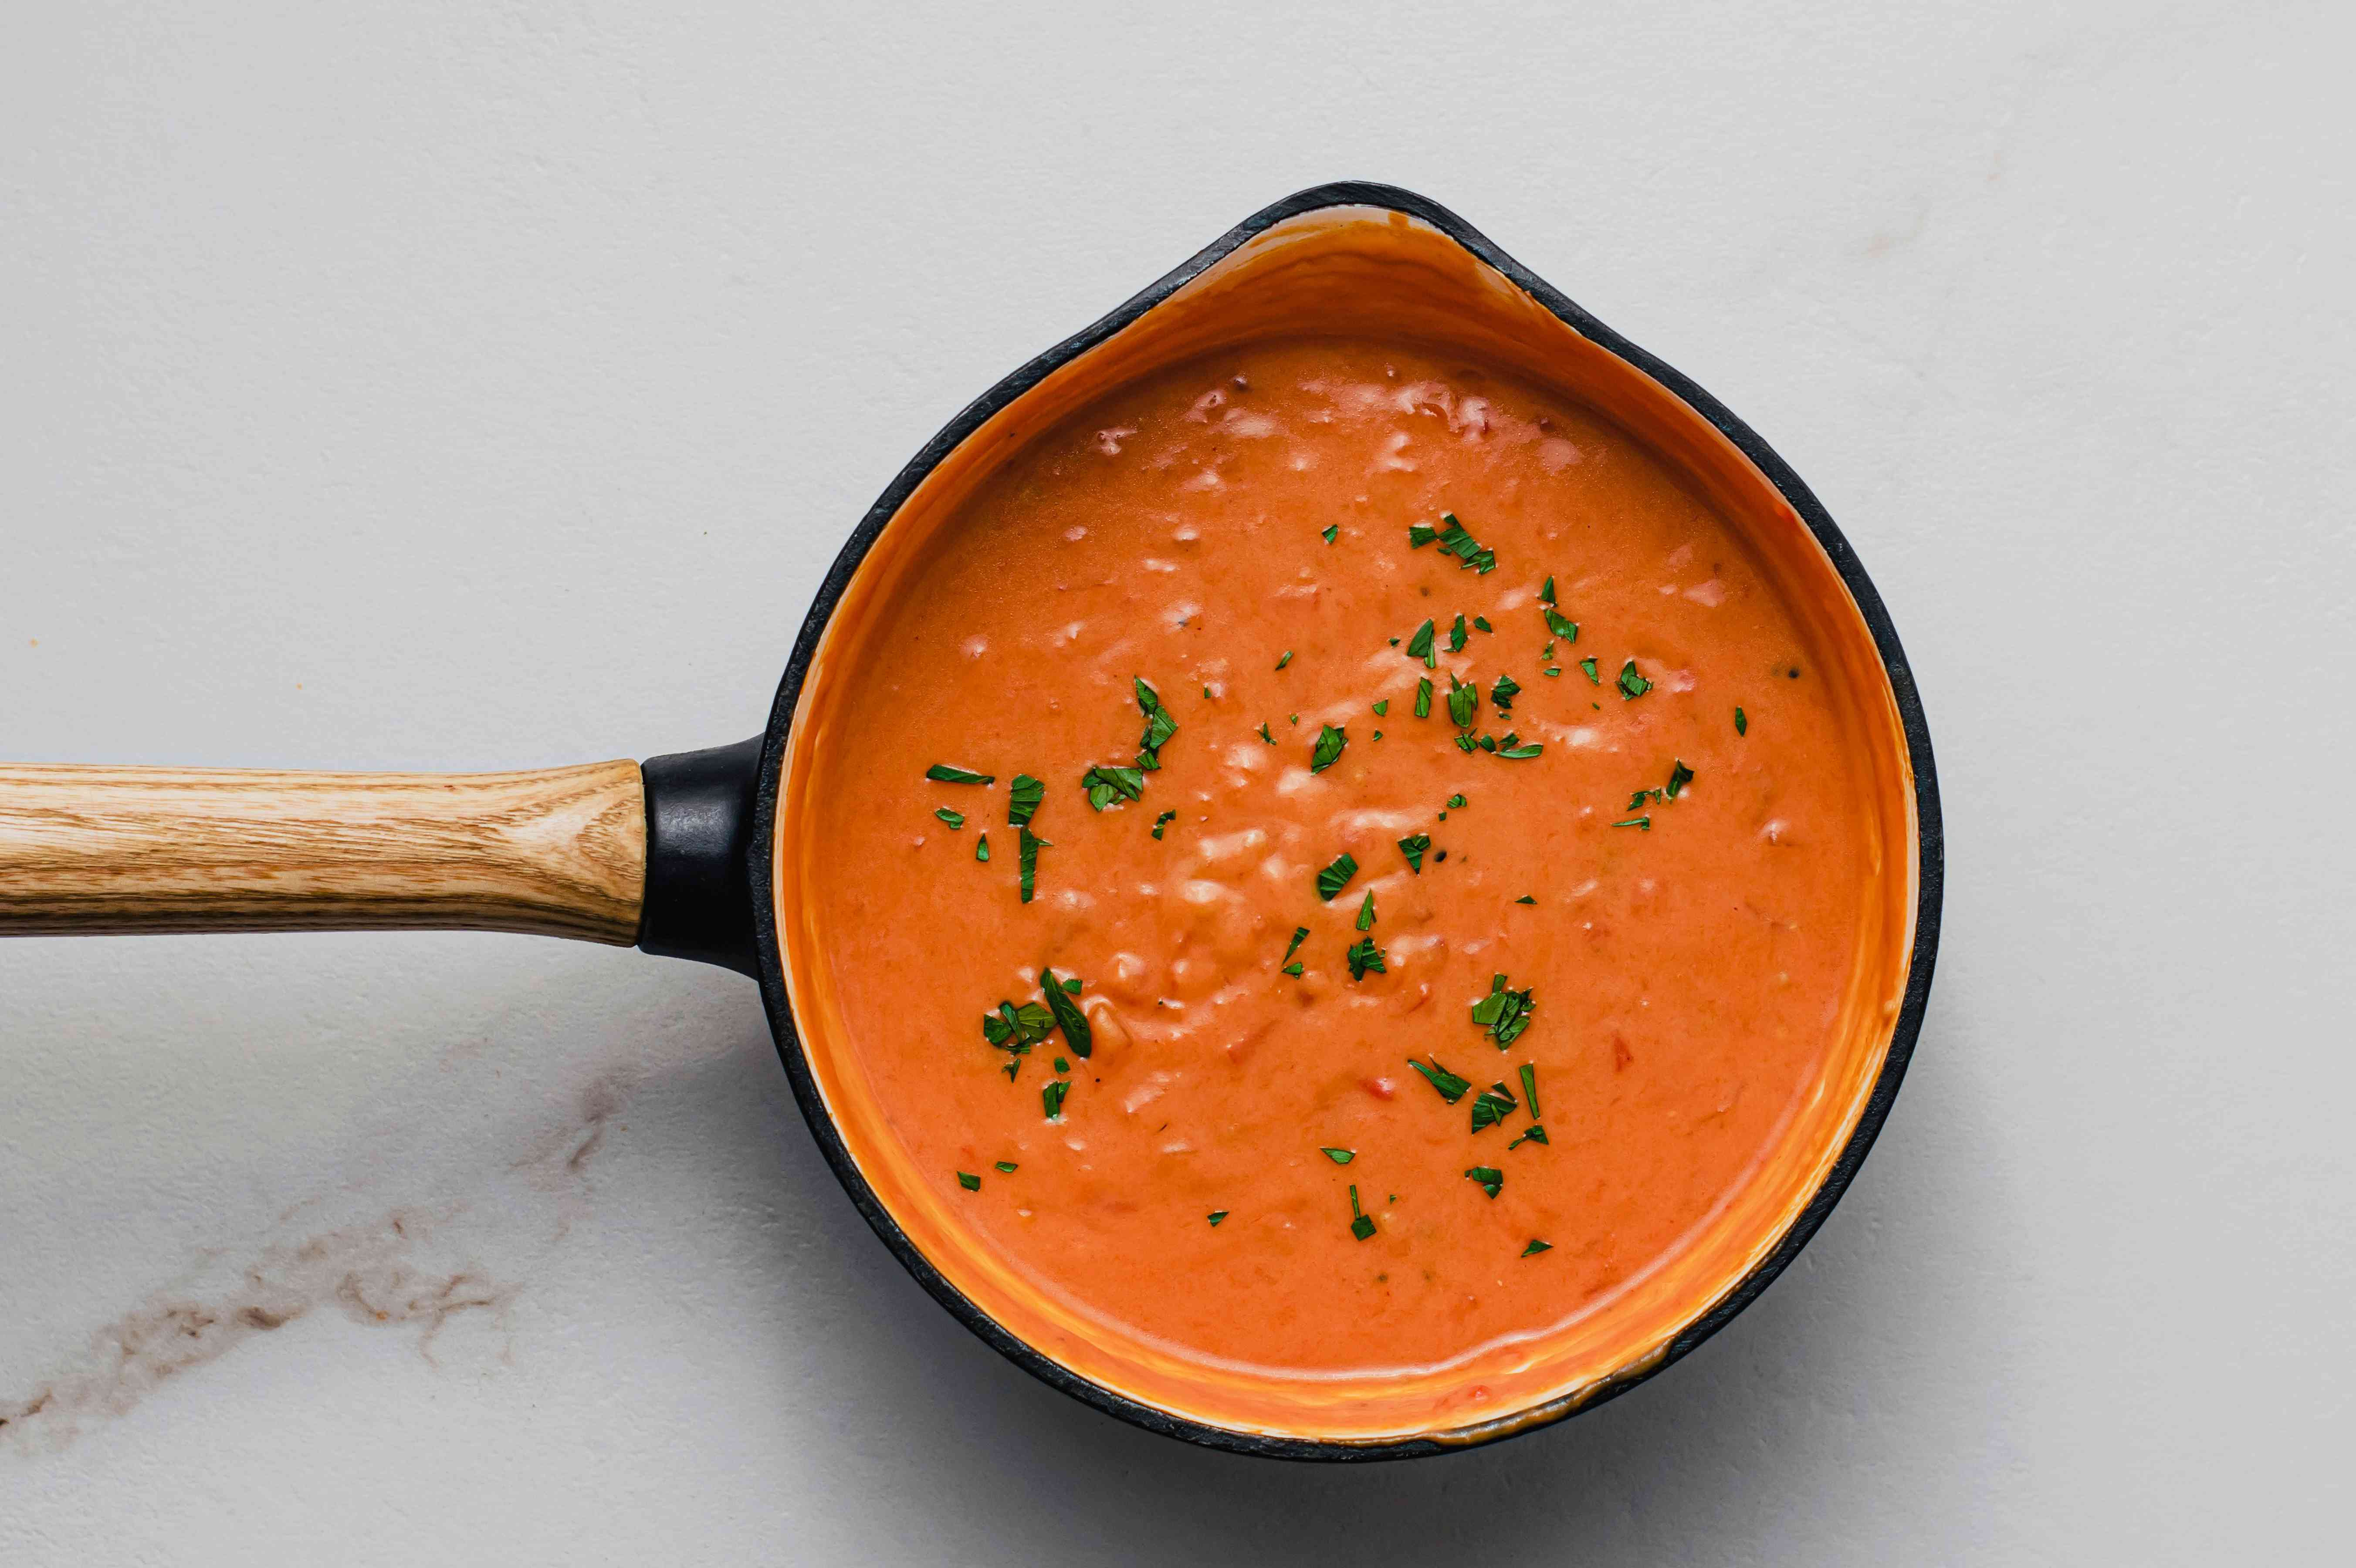 Southern Tomato Gravy - Add Parsley